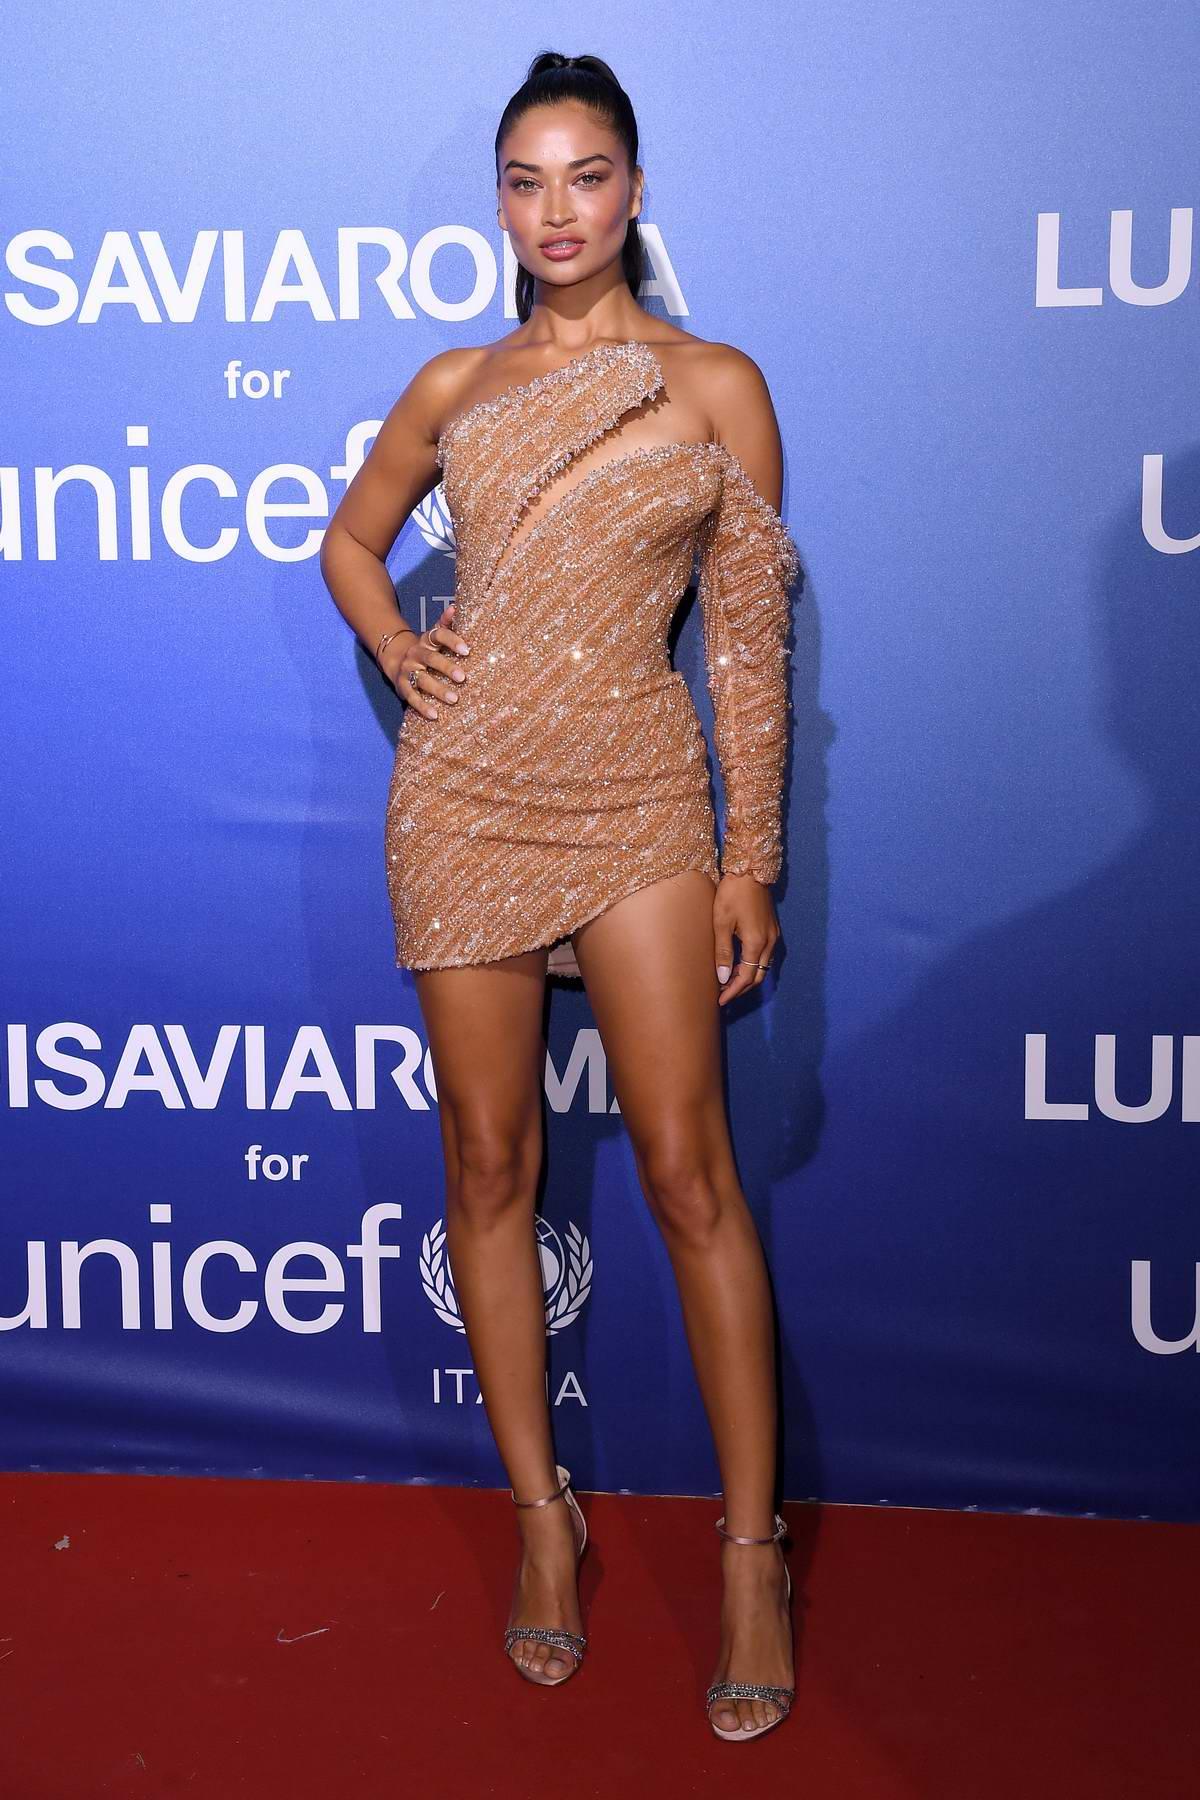 Shanina Shaik attends the UNICEF Summer Gala Presented by LUISAVIAROMA in Sardinia, Italy